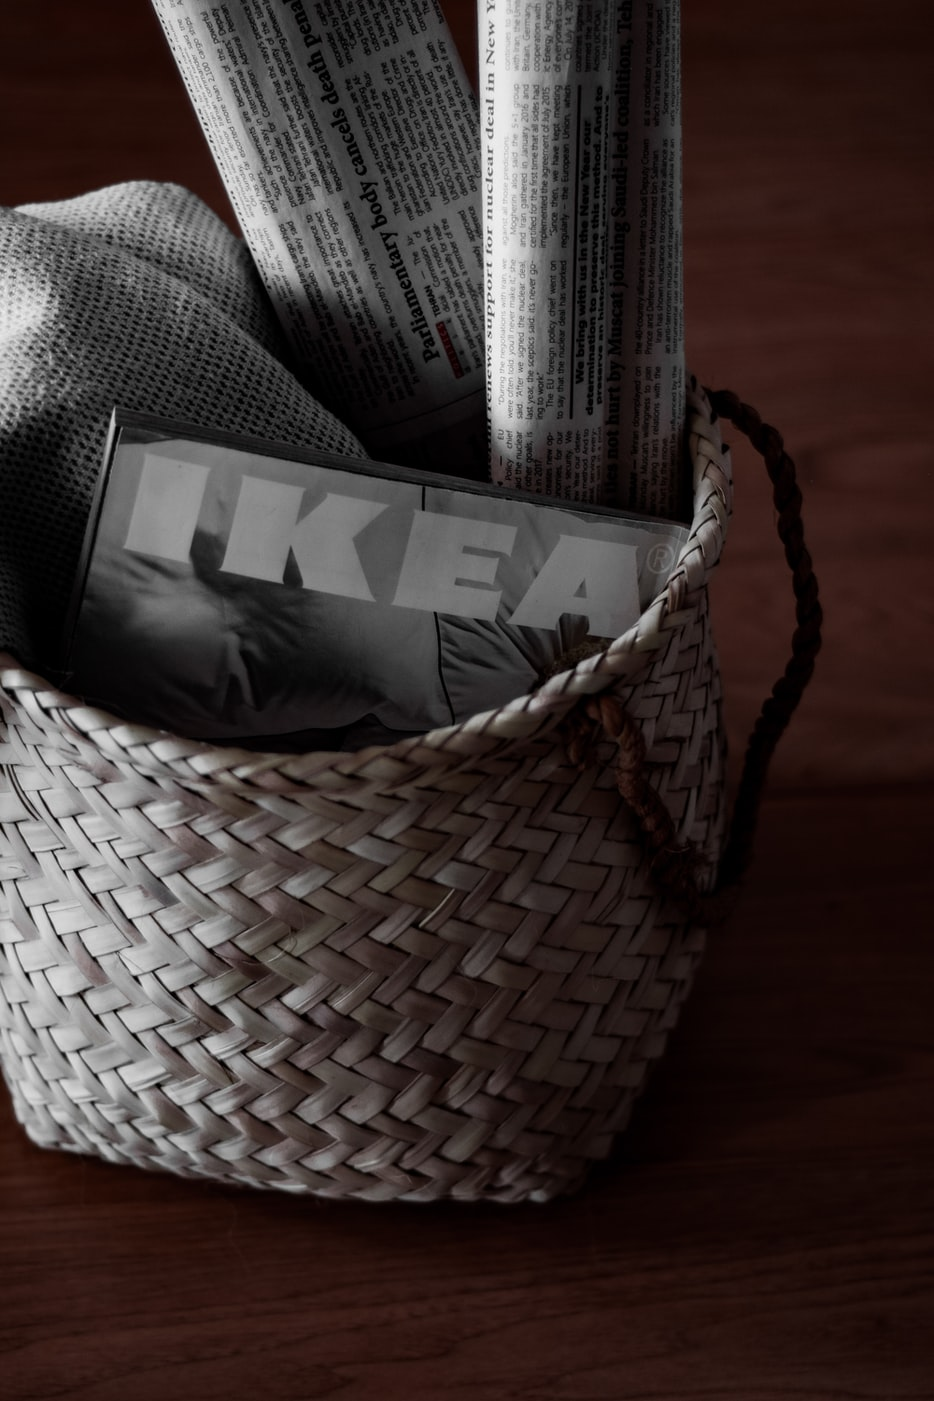 IKEA: Sweden's mark on the world map